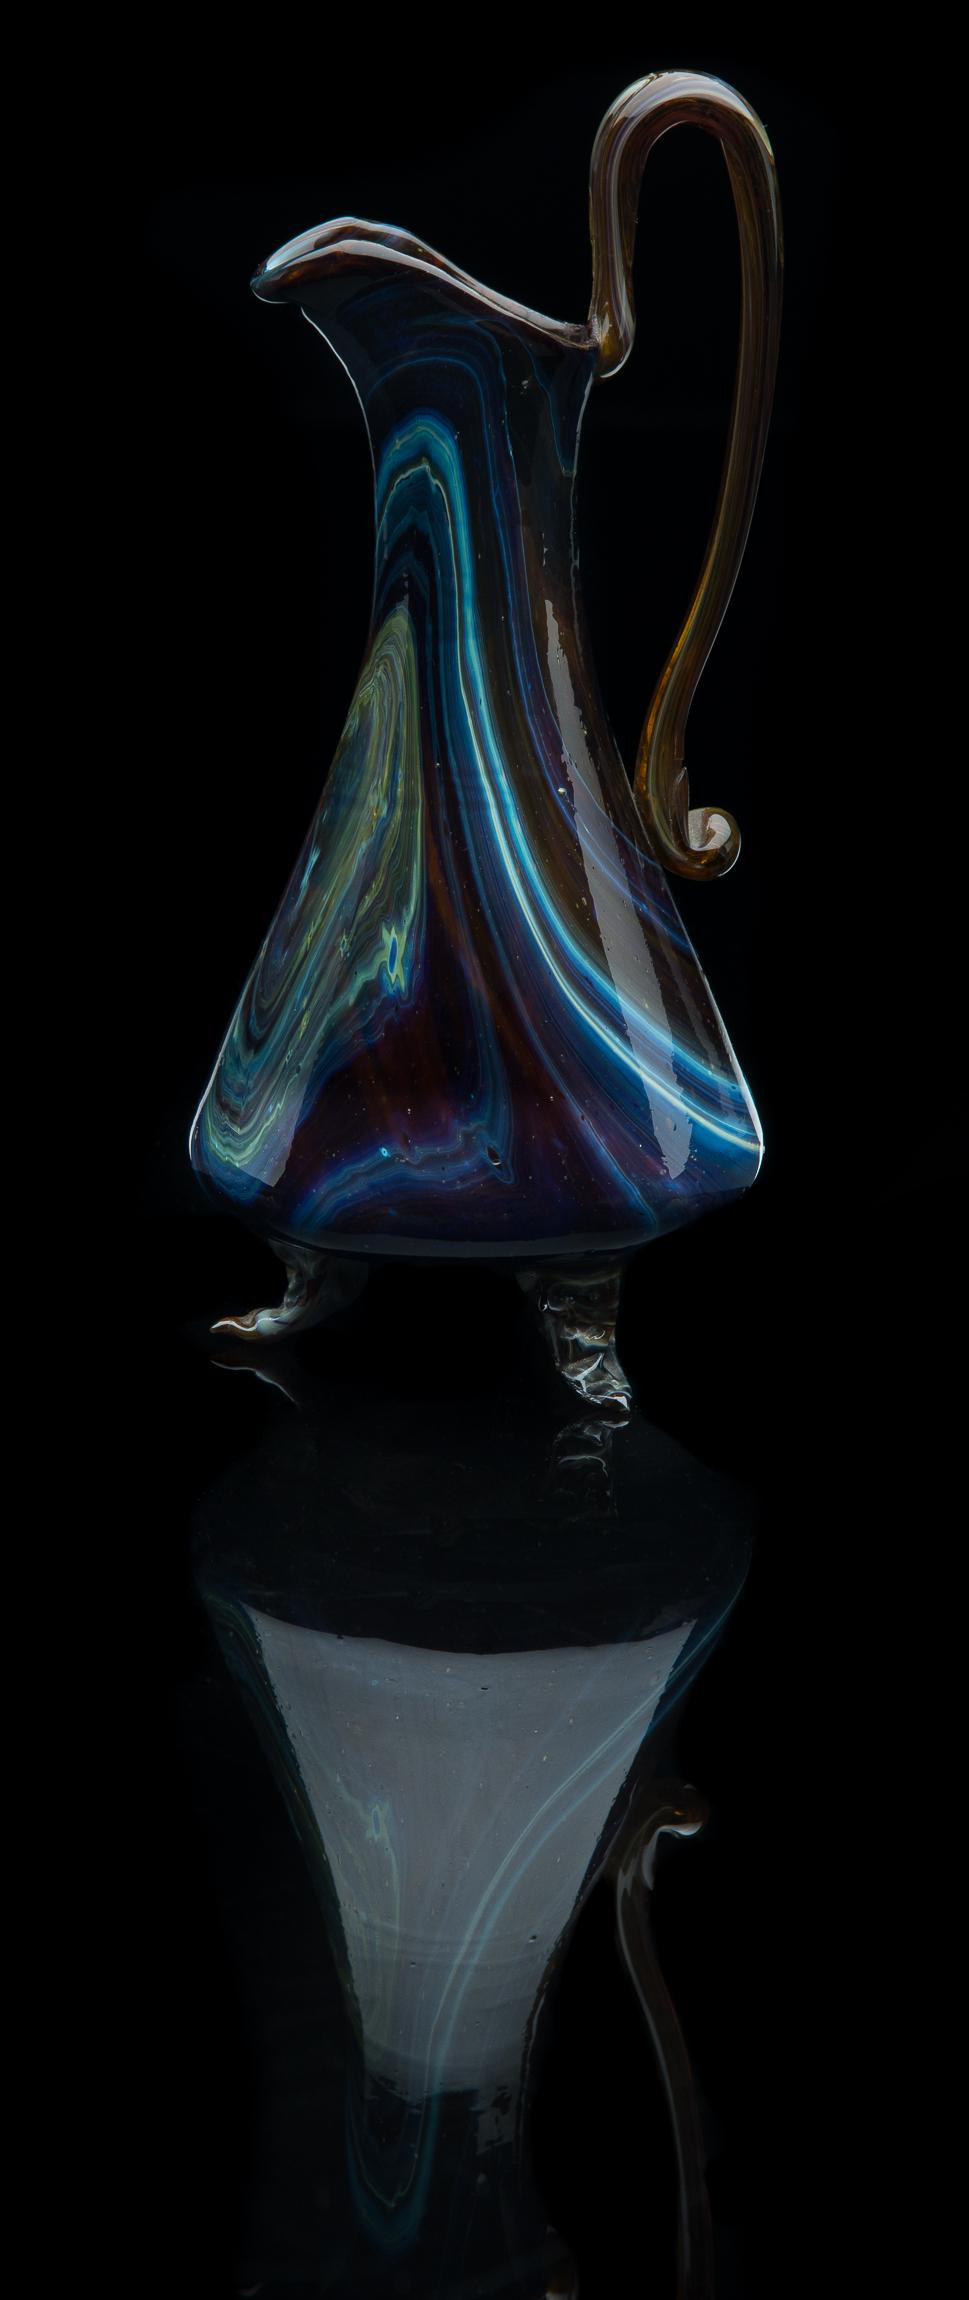 Salviati and Company,  Chalcedony Ewer  (circa 1860, glass, 7 3/4 inches), VV.400